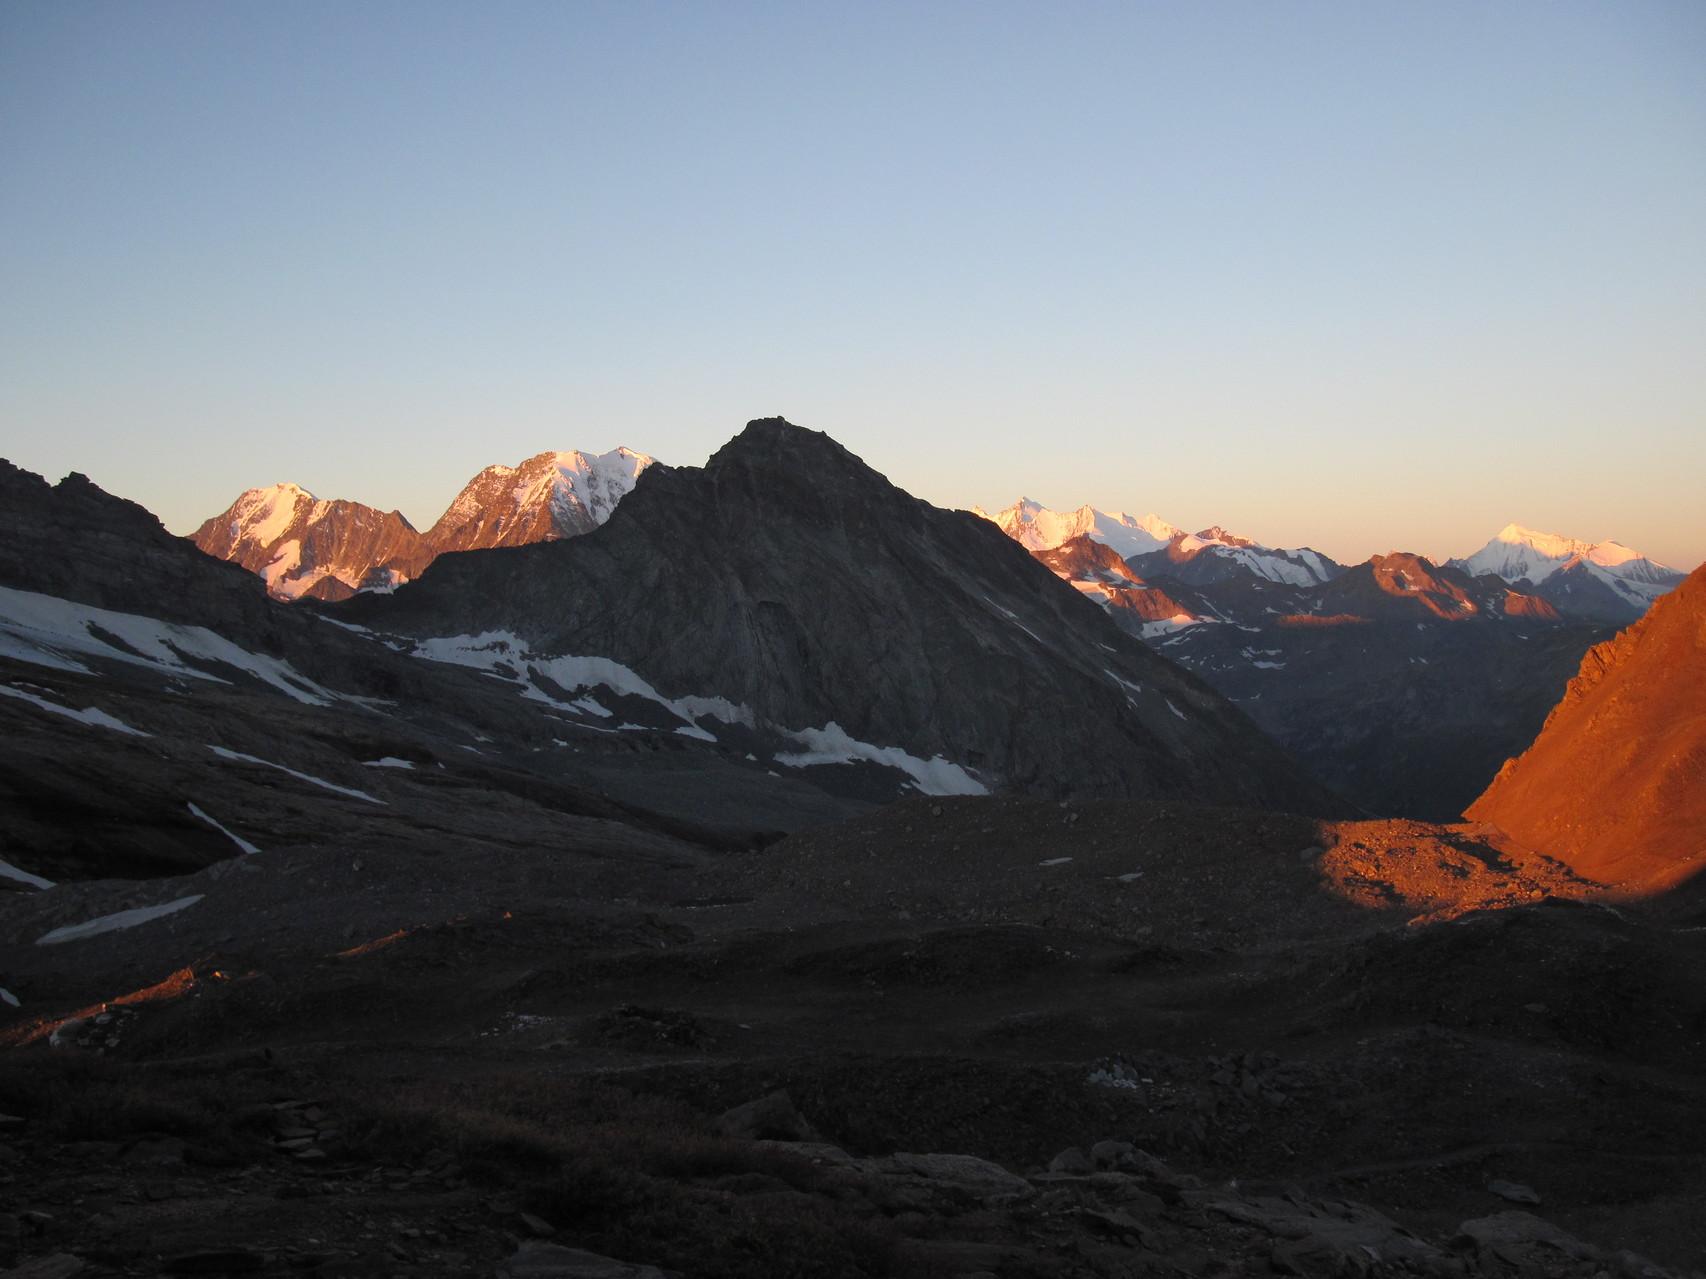 Sonnenaufgang über dem Wallis